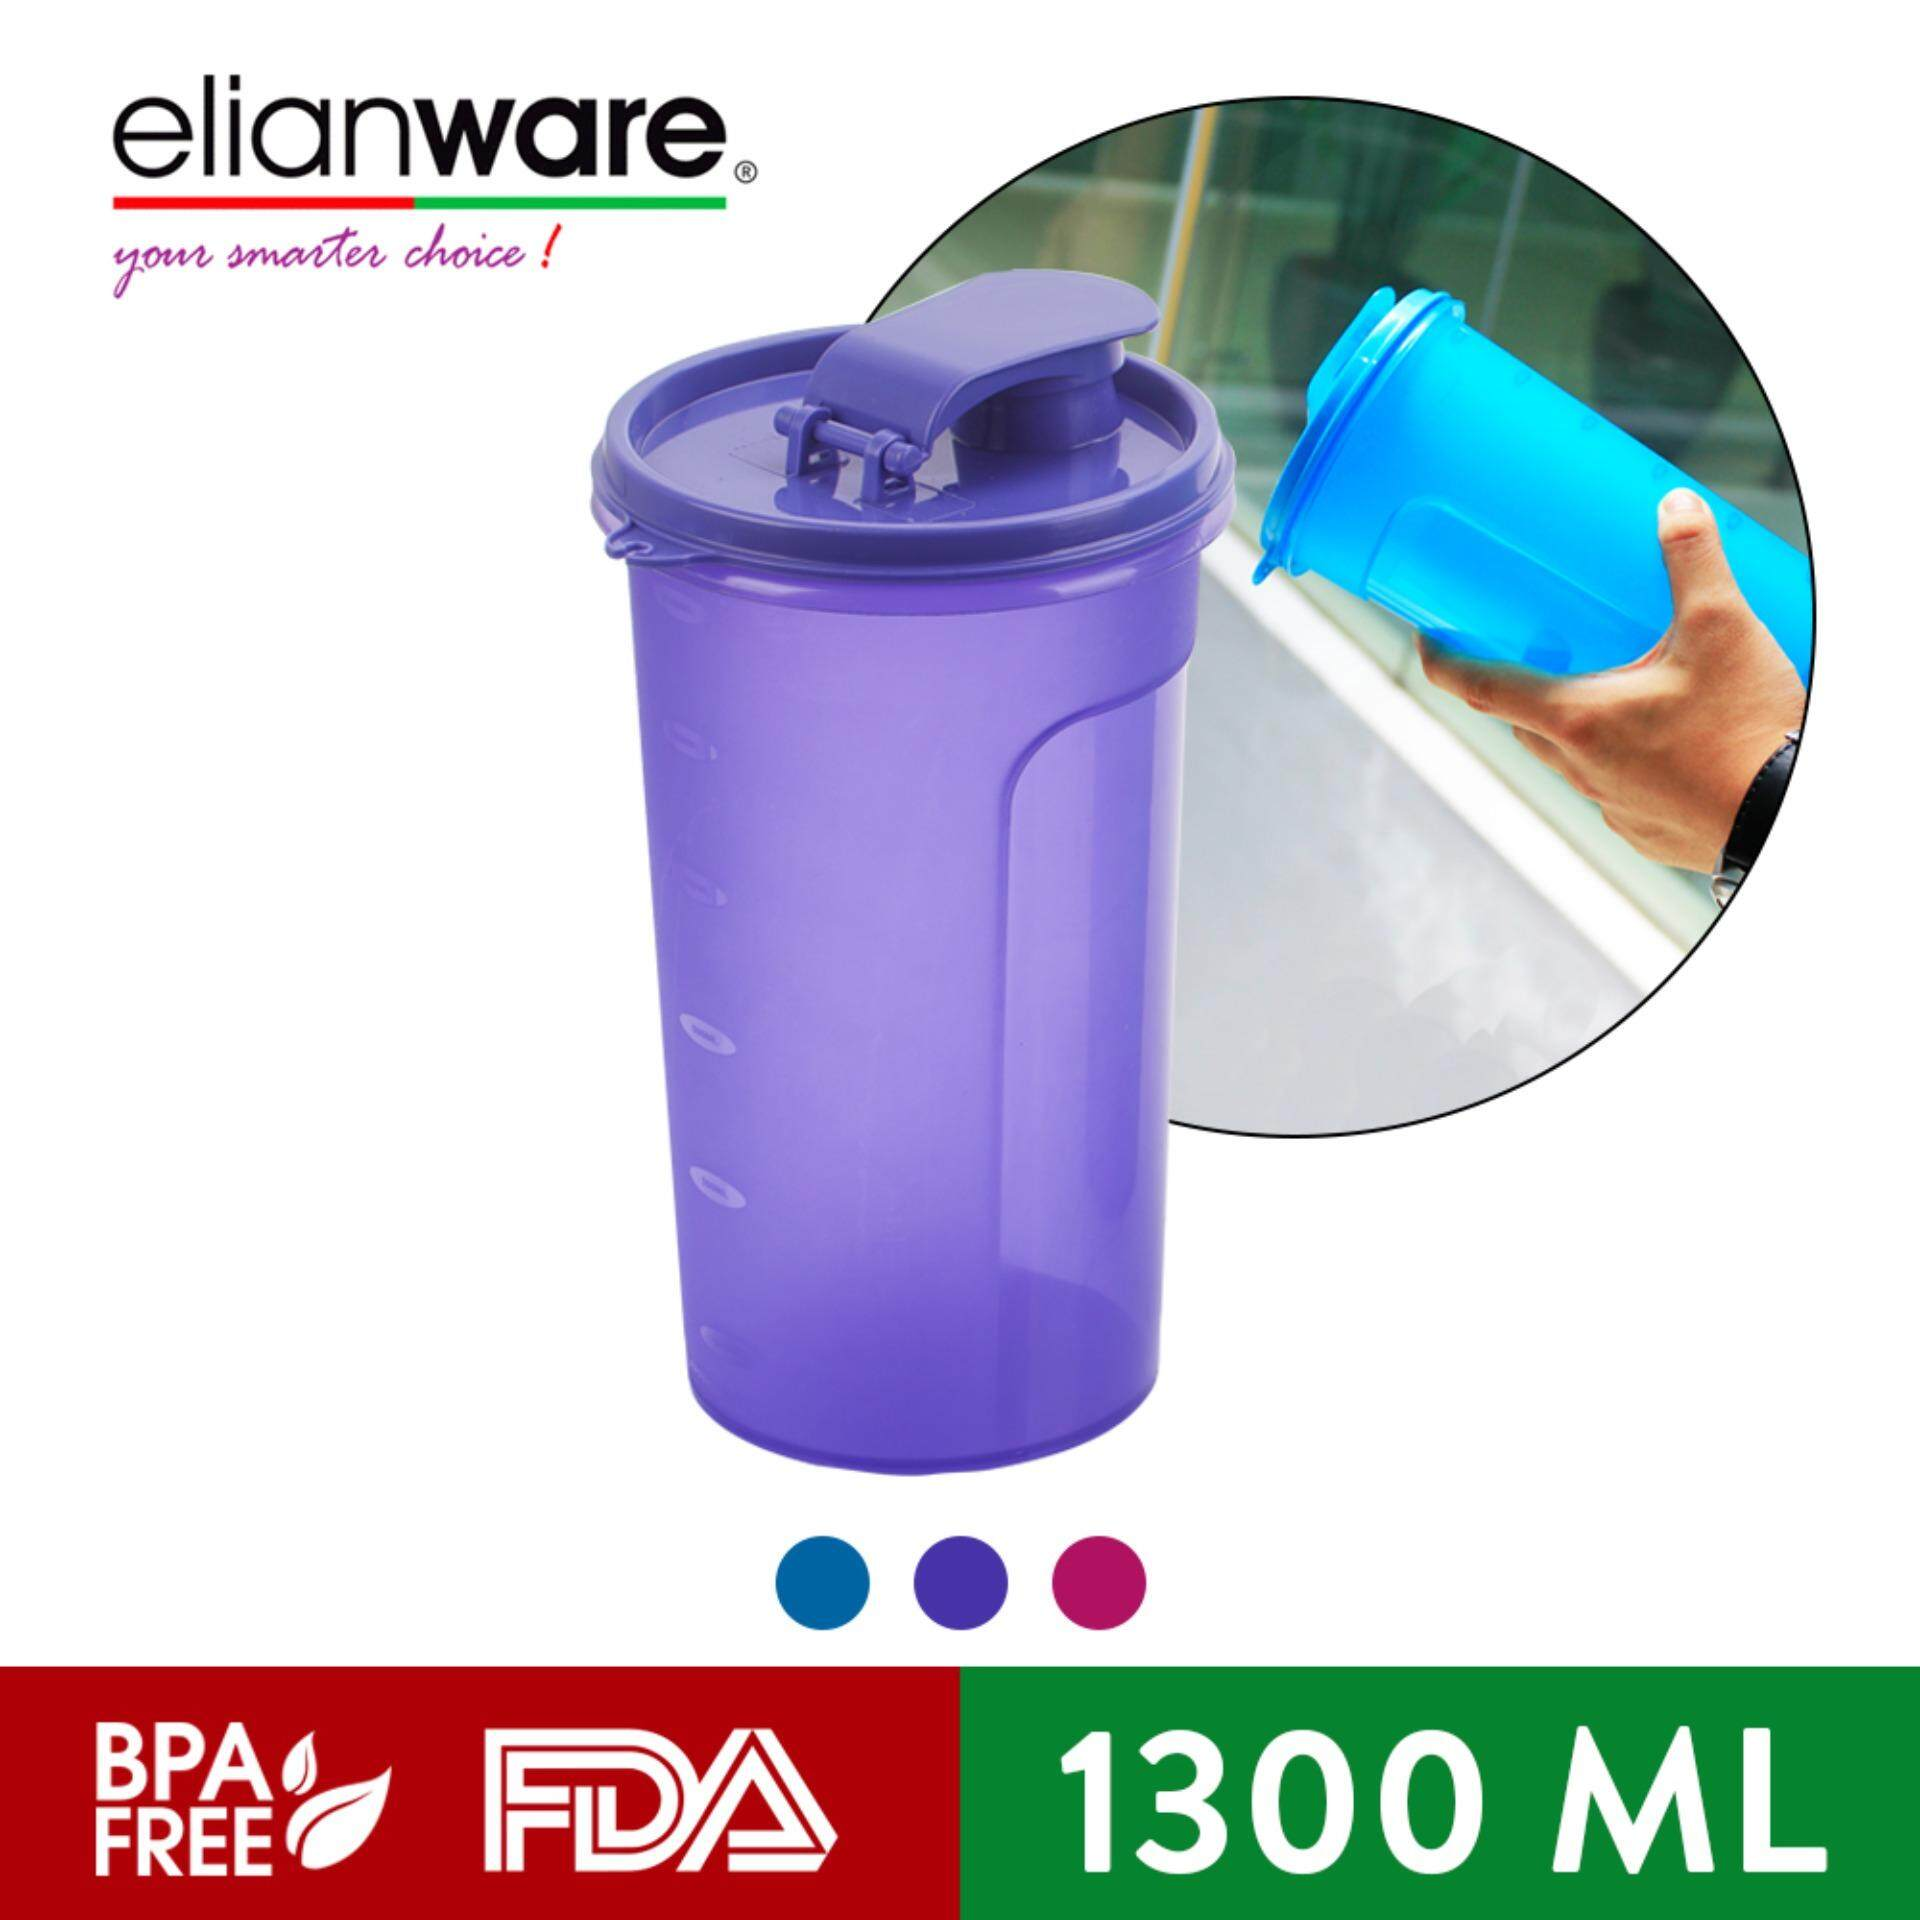 Elianware 1.3 Ltr Large E-Fresh Fridge Home BPA Free Water Bottle